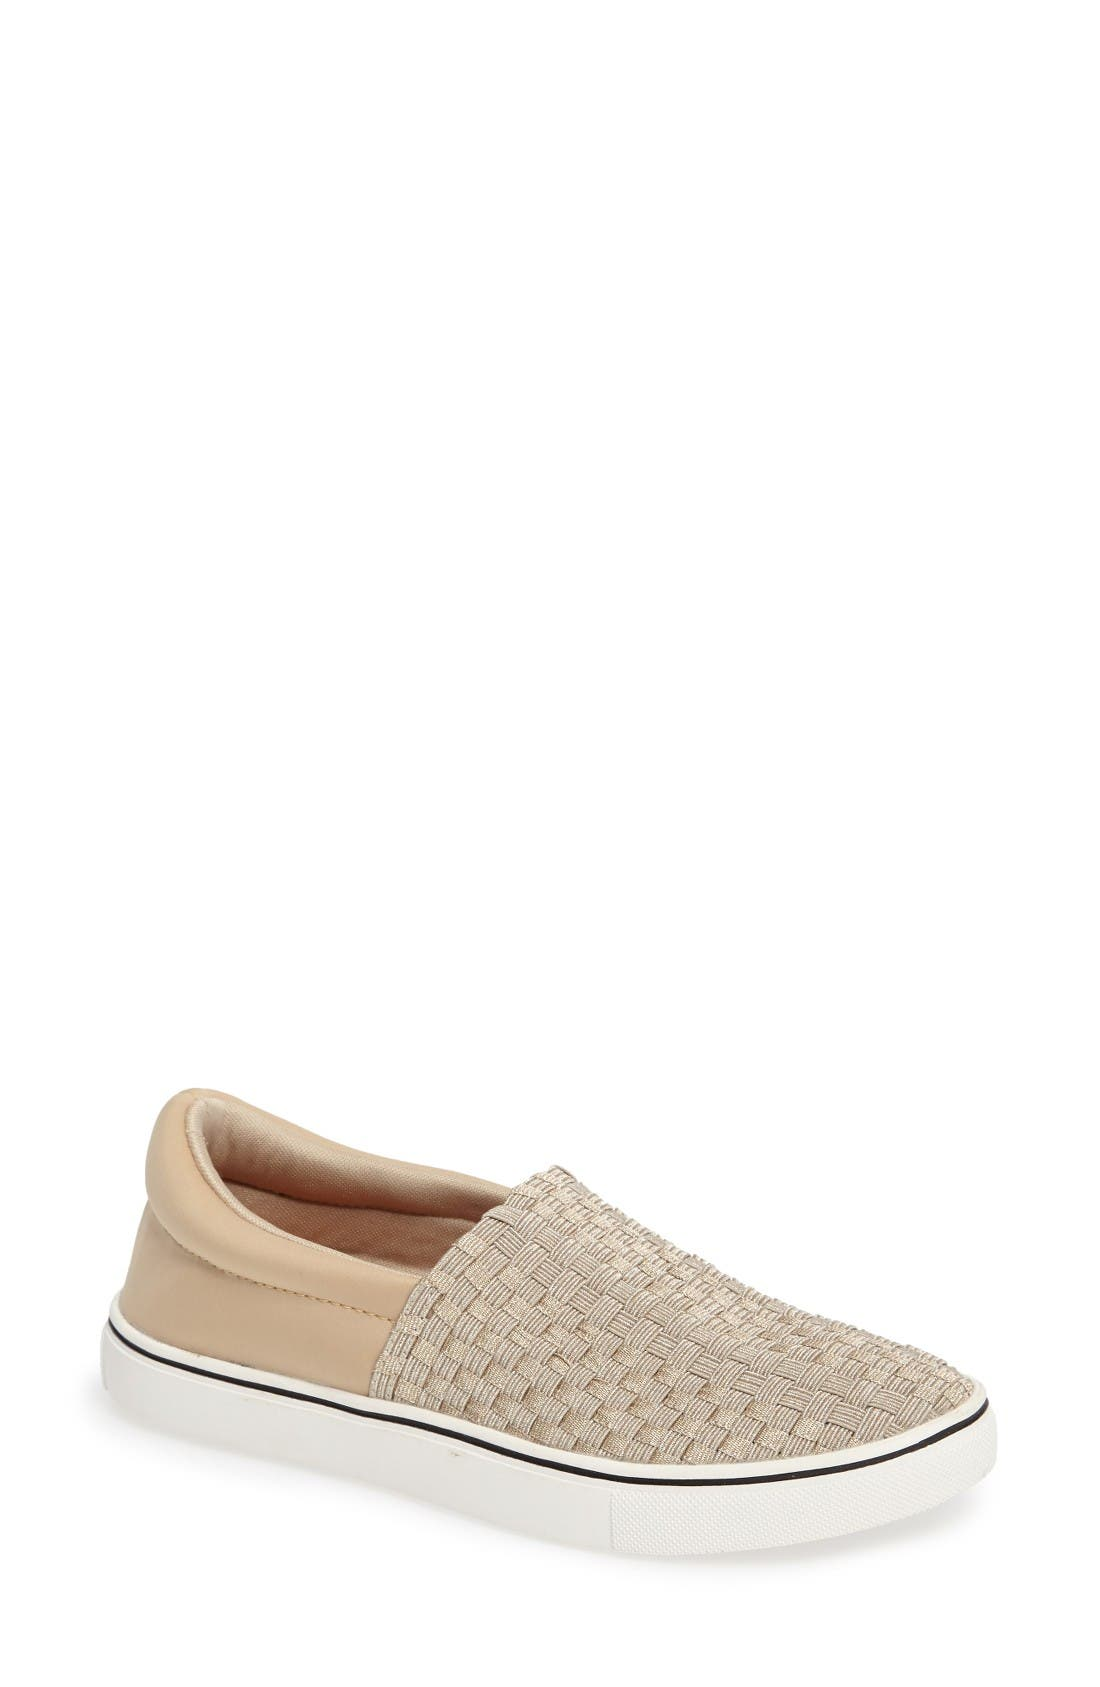 Ofelia Woven Elastic Sneaker,                         Main,                         color, Light Gold Fabric